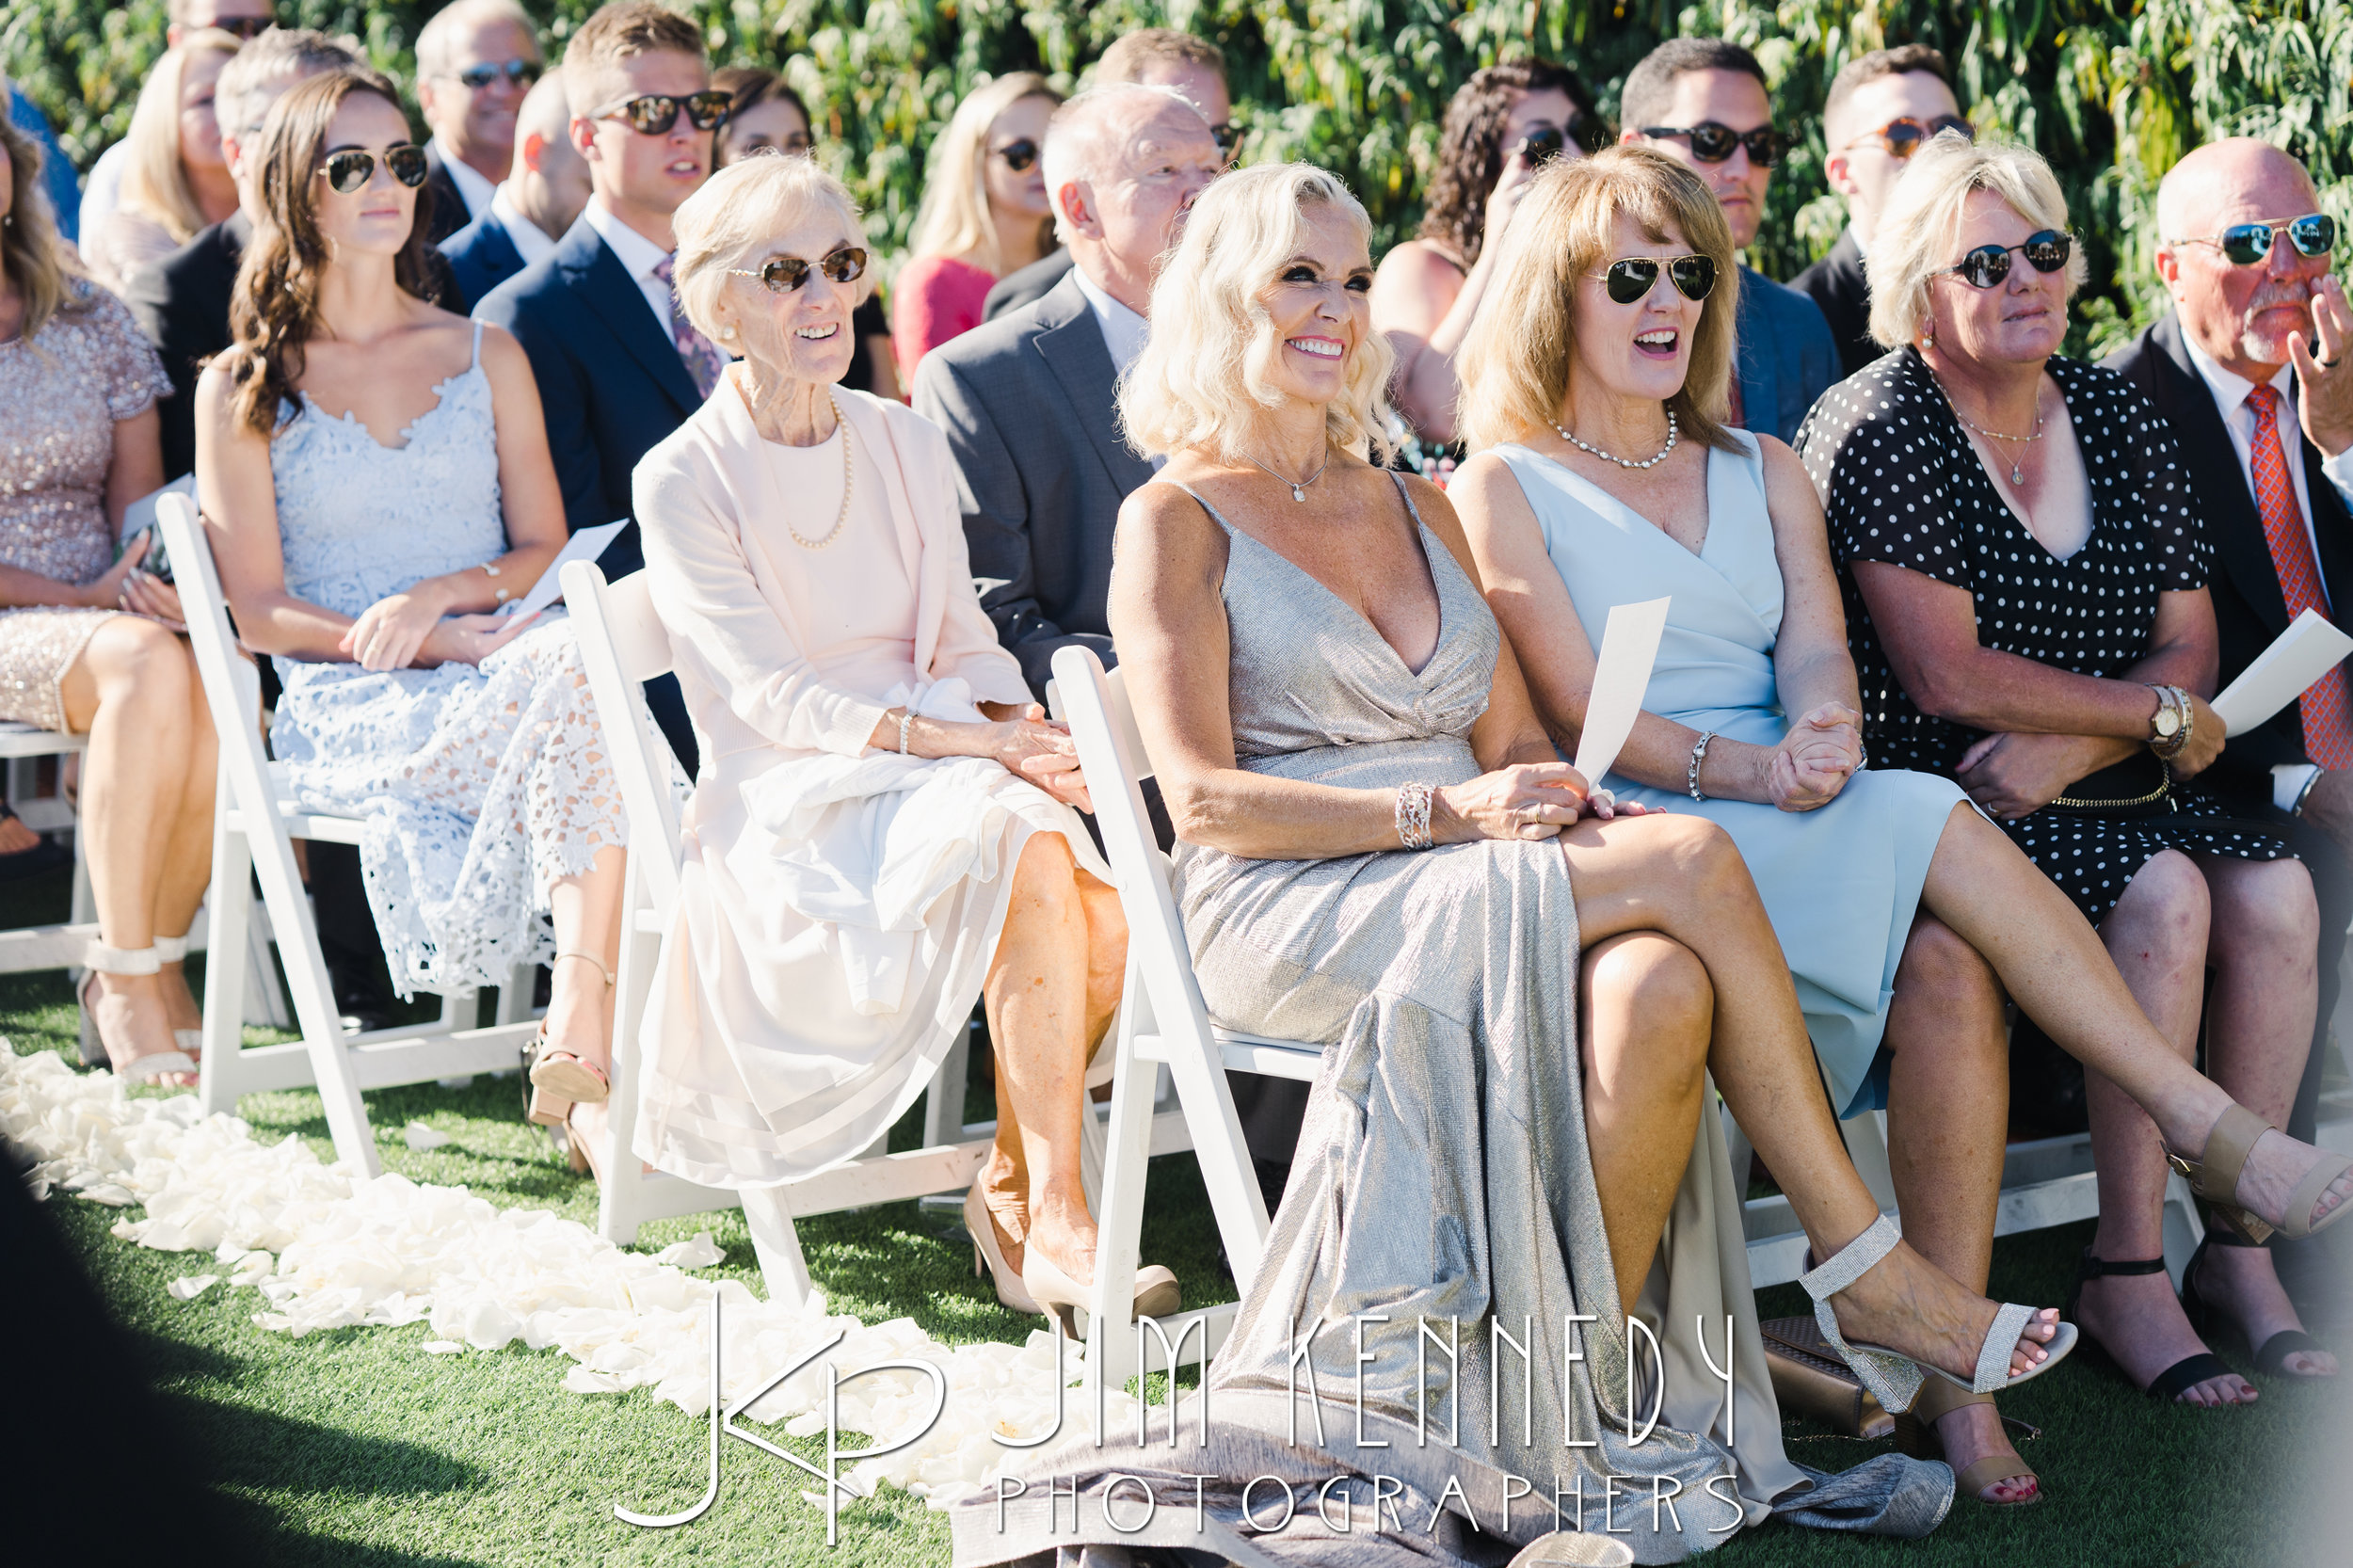 balboa-bay-resort-wedding-brooke-kevin_0100.JPG